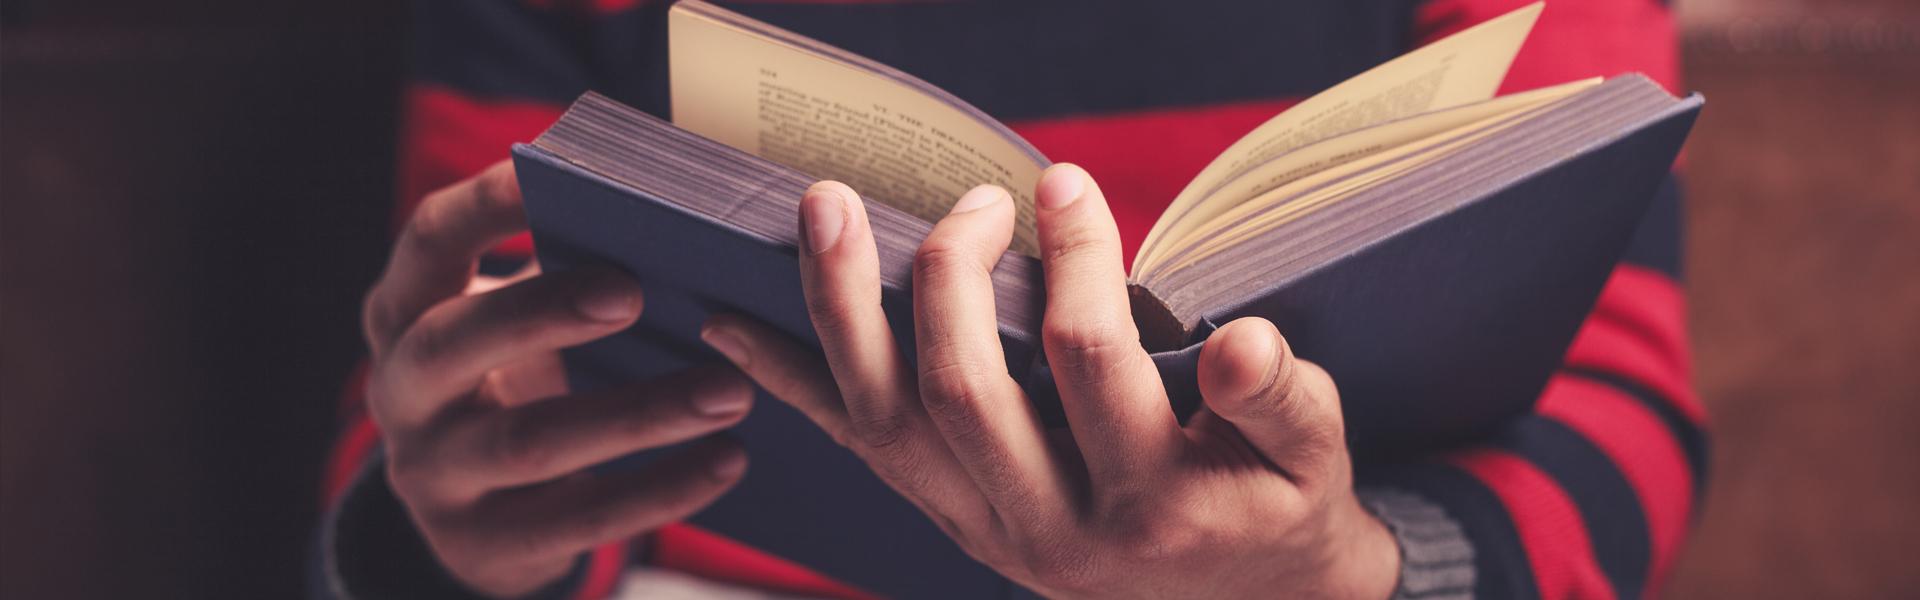 The cornerstone catholic scripture study